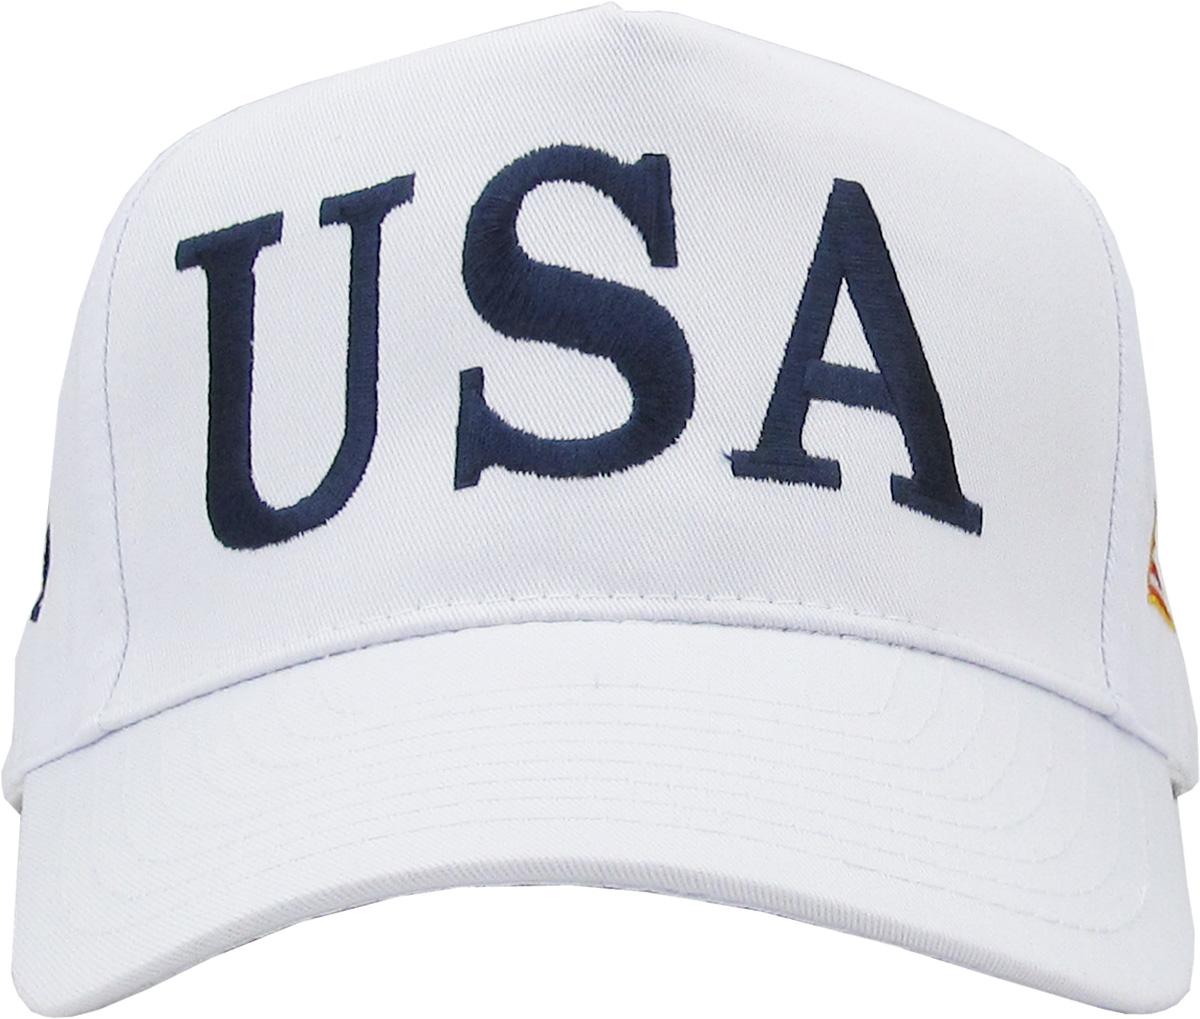 25b9e5fd2a6 USA TRUMP HAT - 45TH PRESIDENT - MAKE AMERICA GREAT AGAIN - Walmart.com